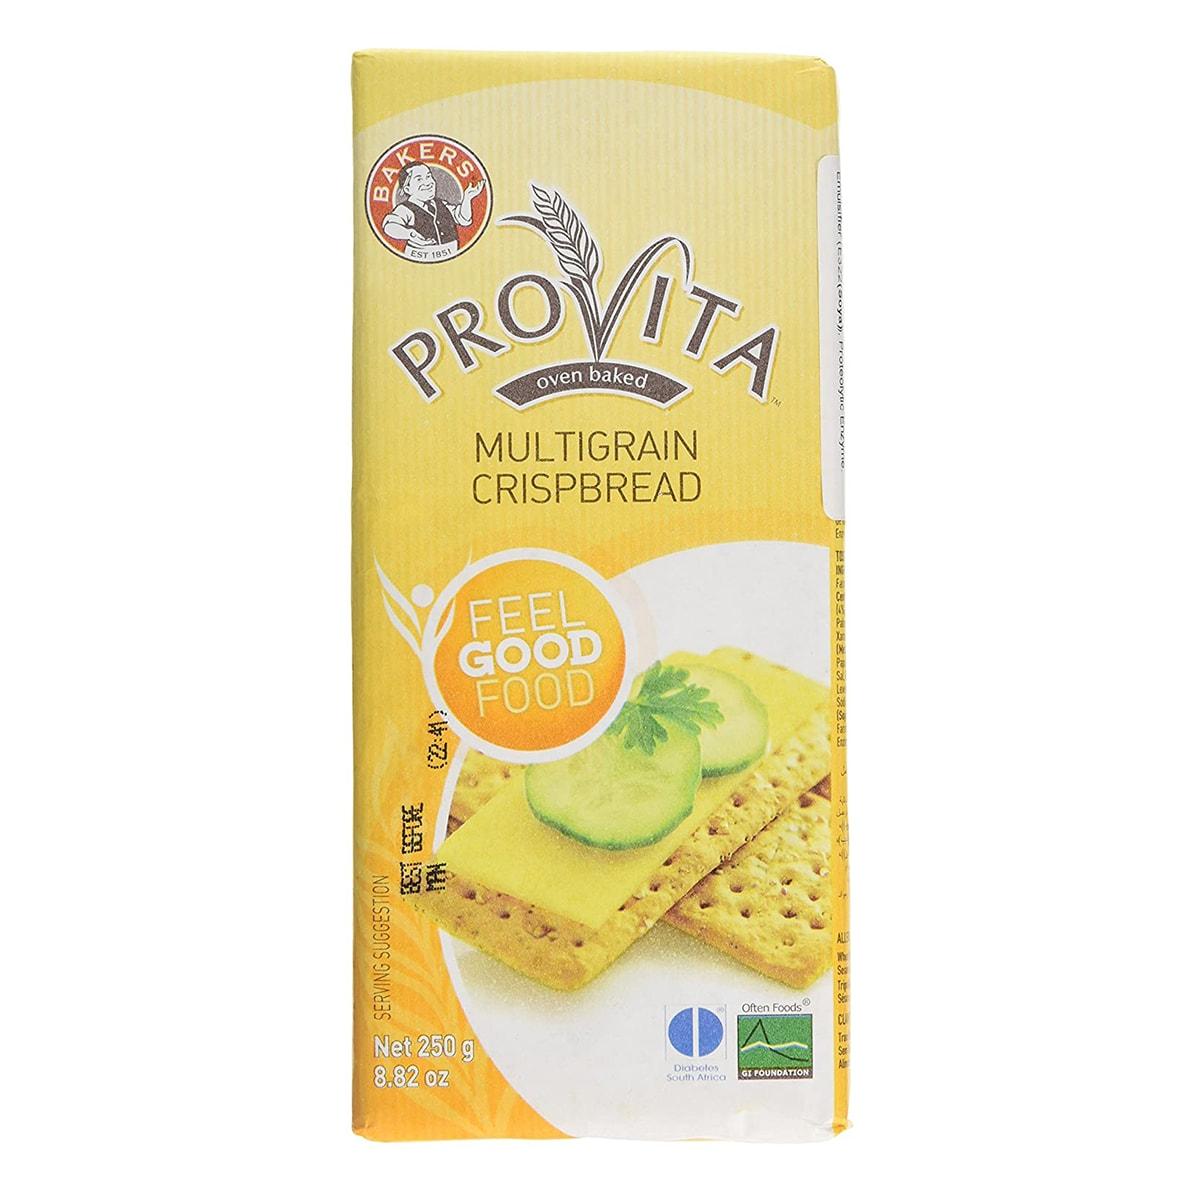 Buy Bakers Provita Multigrain Crispbread - 250 gm